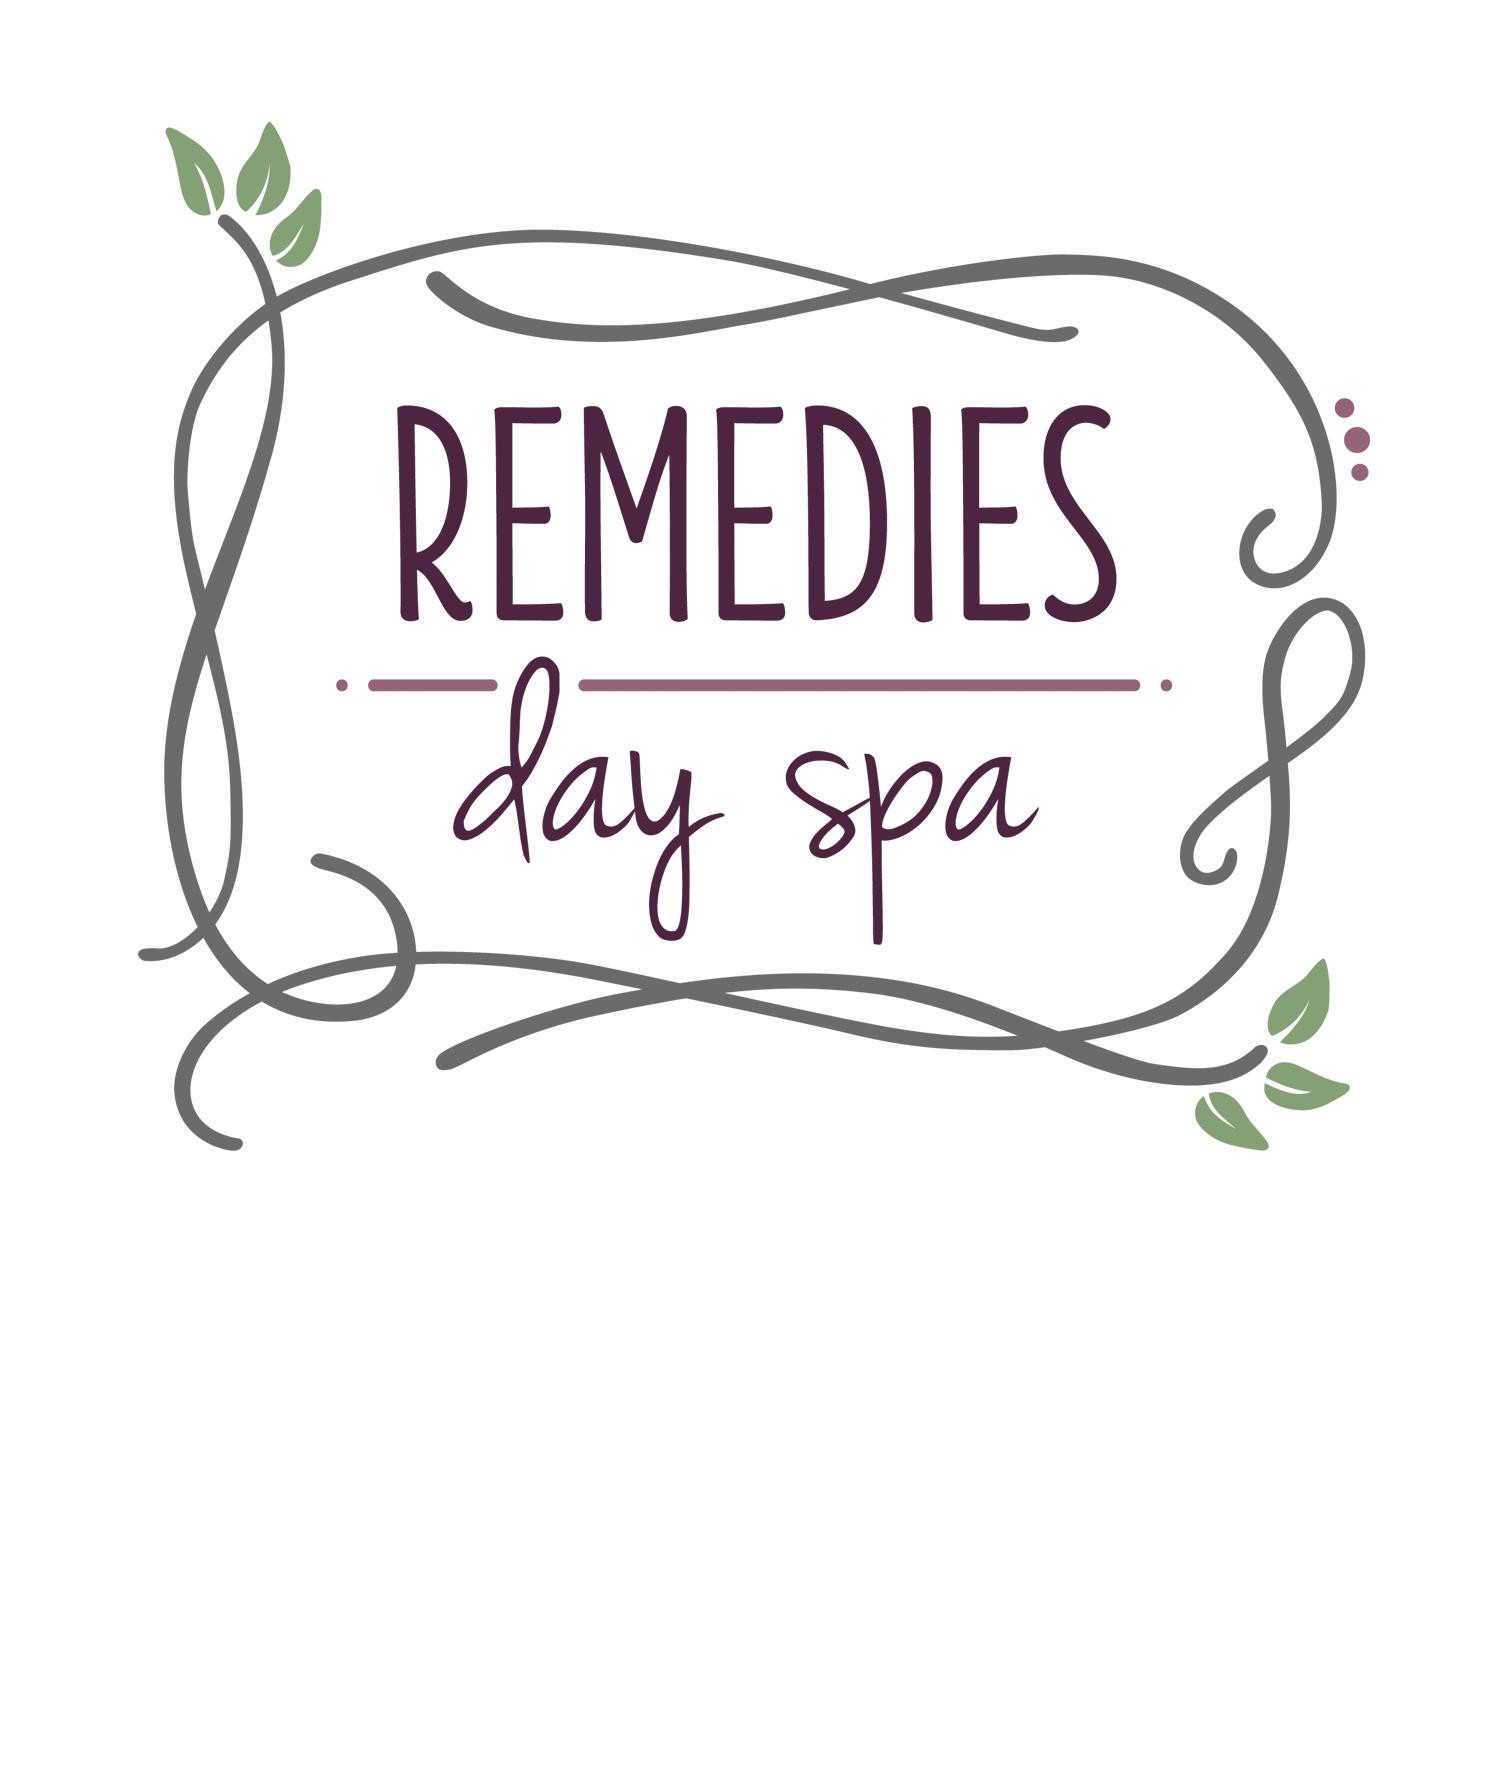 Remedies Day Spa